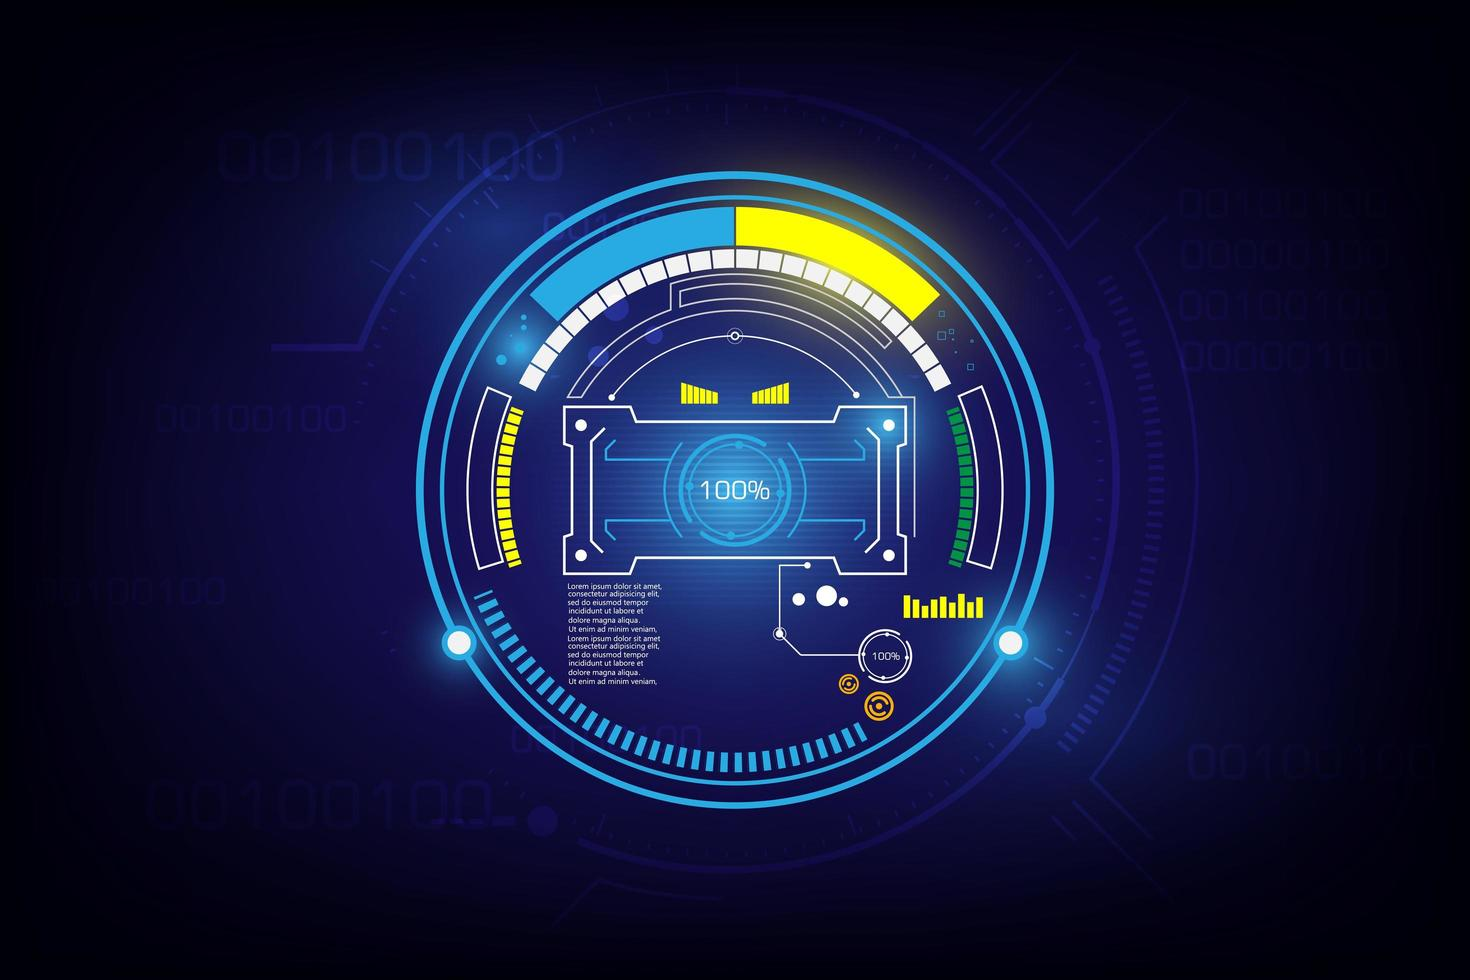 futuristisk sci-fi laddar skärmdesign vektor